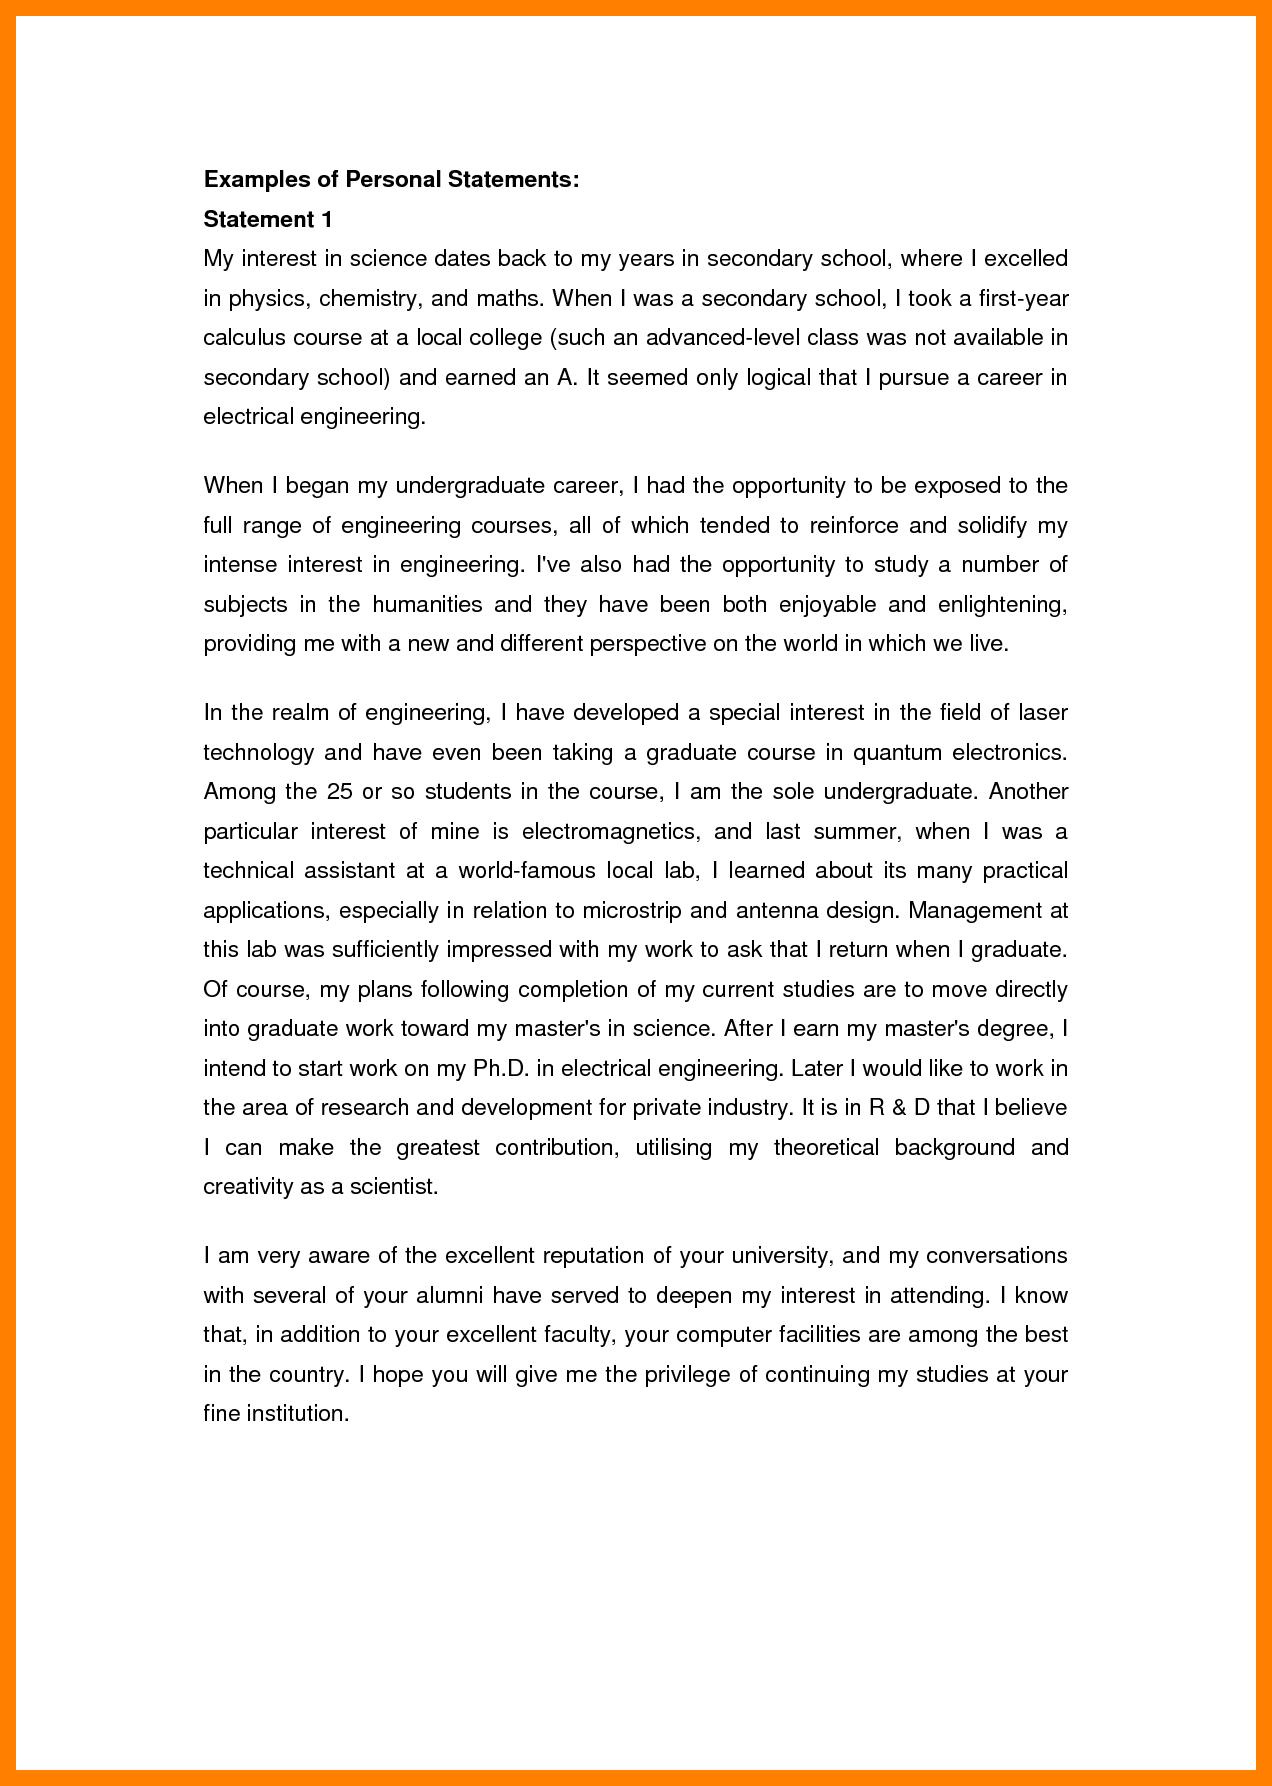 most creative college essays